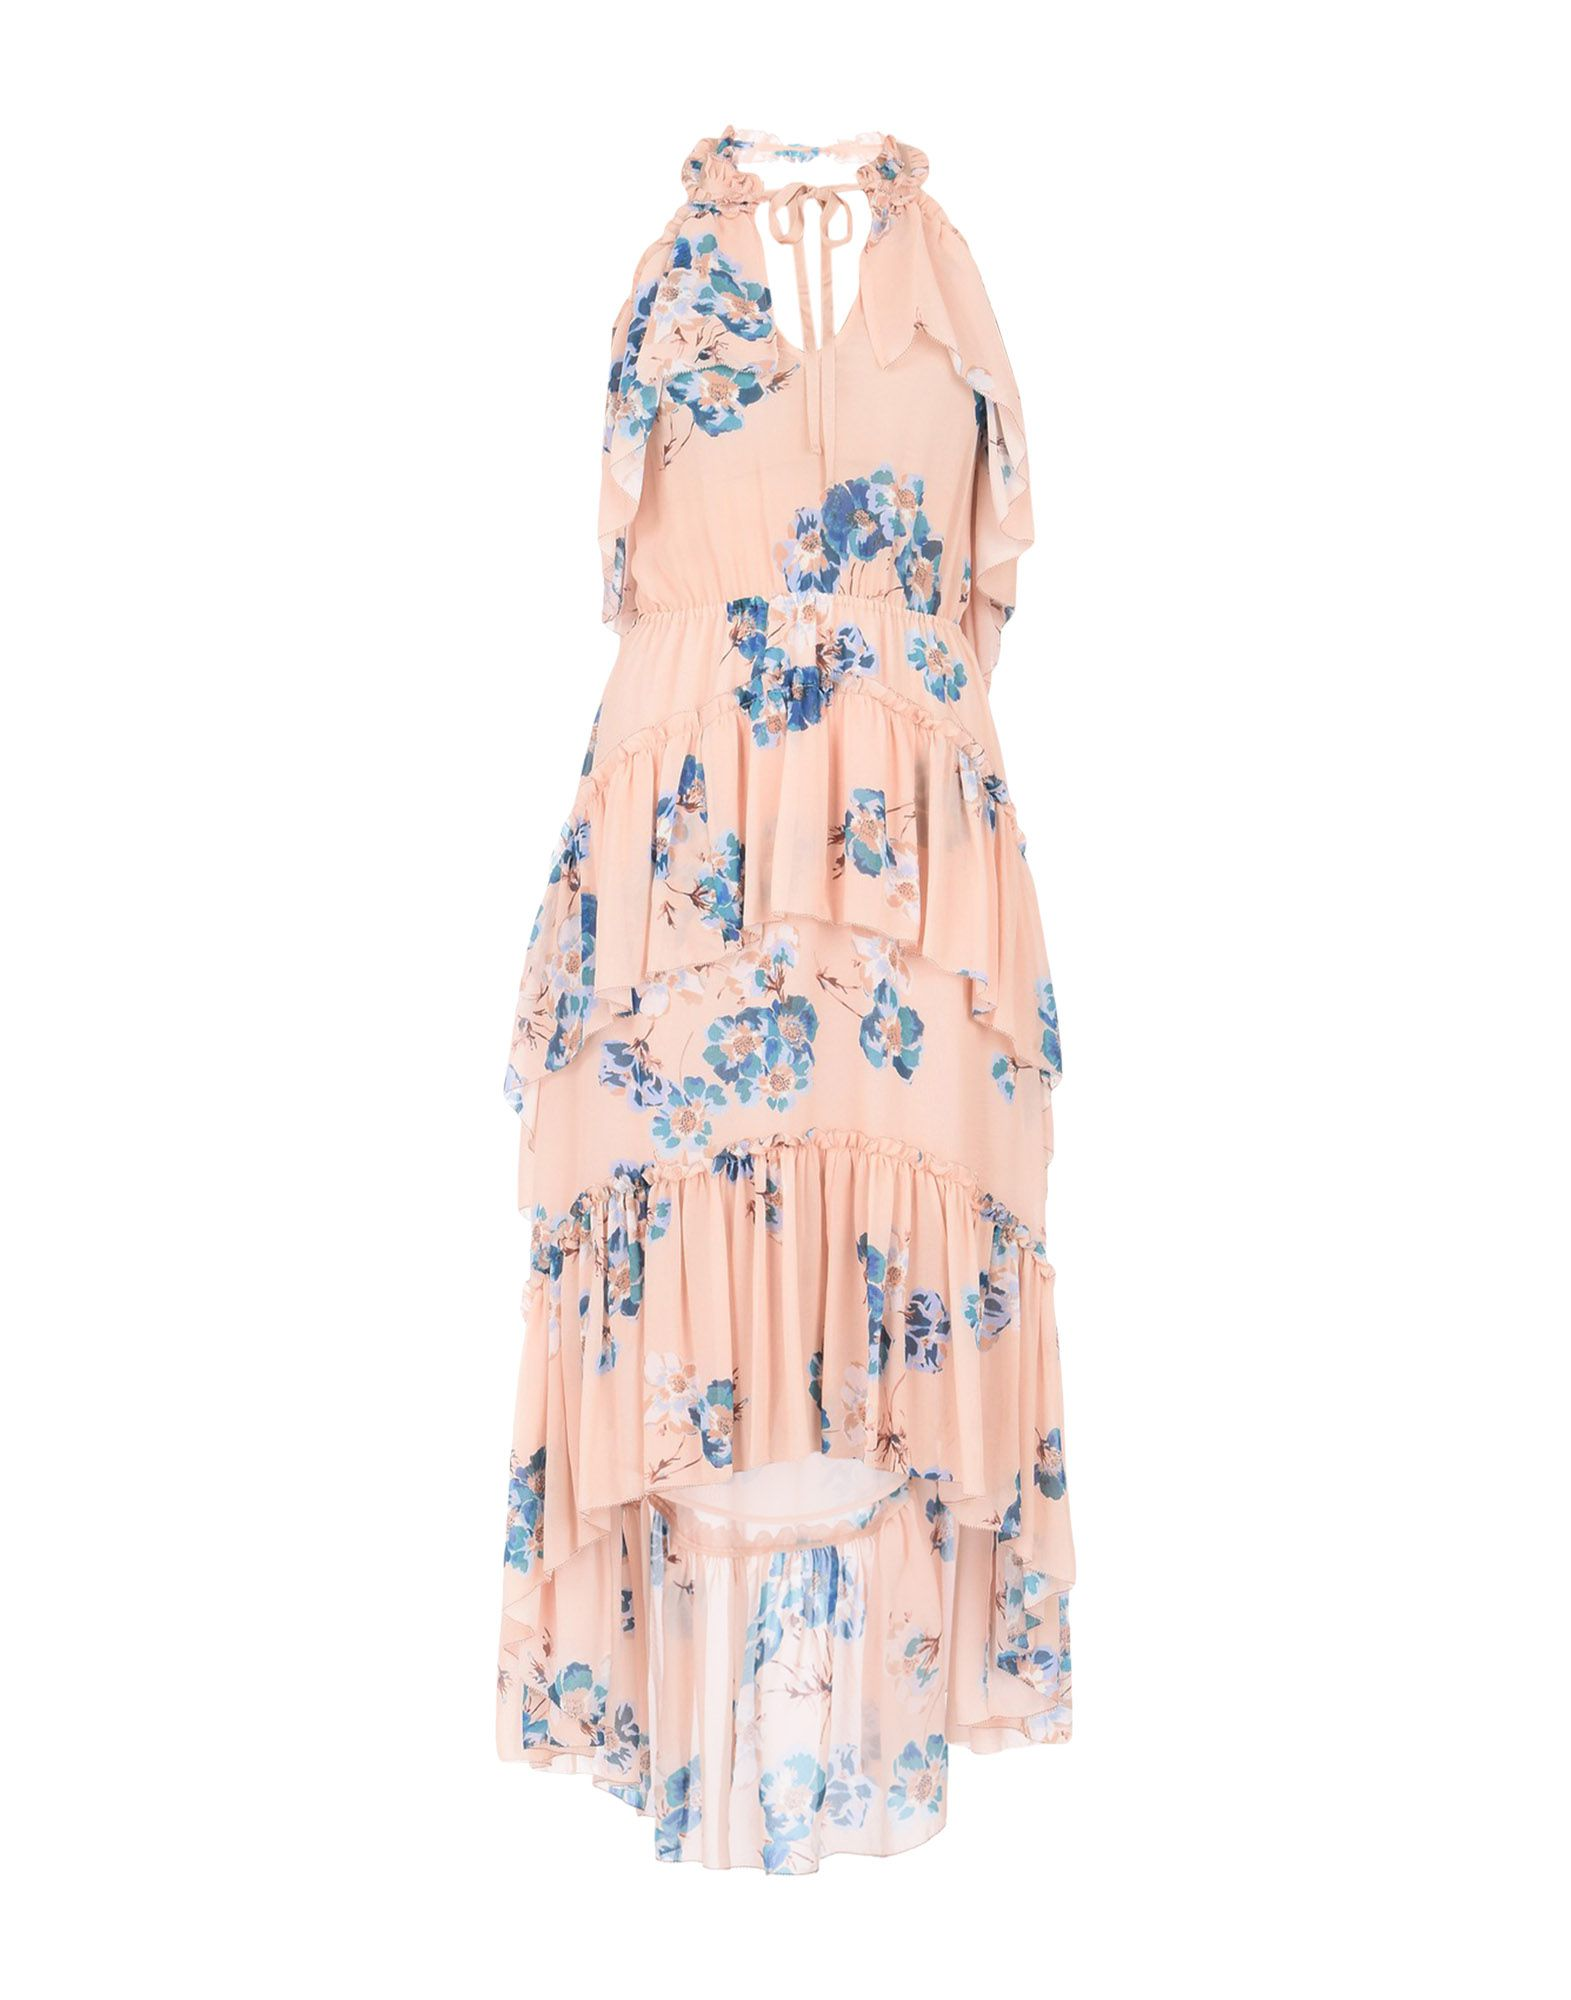 ULLA JOHNSON Платье длиной 3/4 платье ulla popken ulla popken ul002ewwcf70